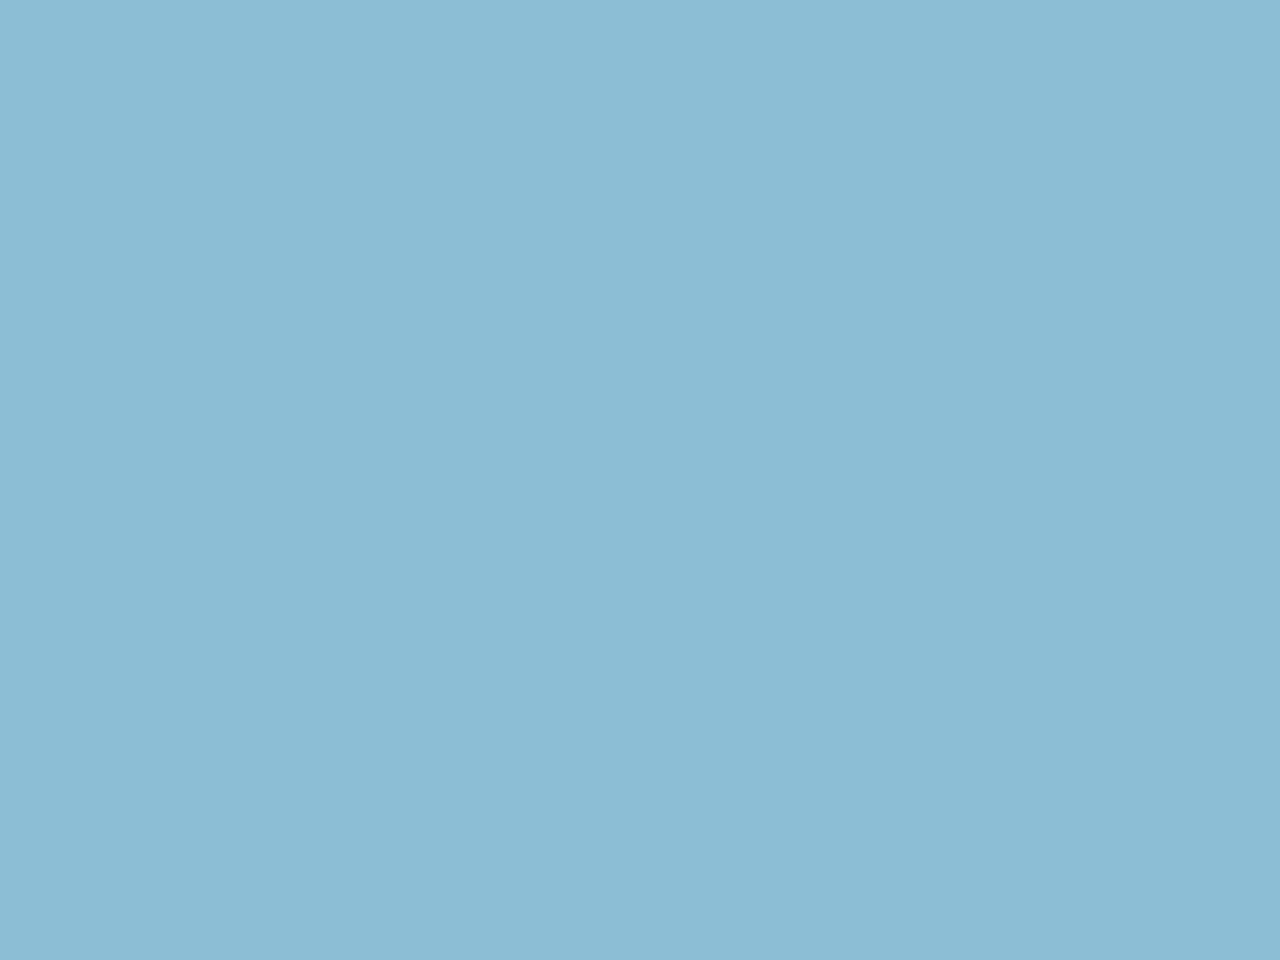 1280x960 Dark Sky Blue Solid Color Background